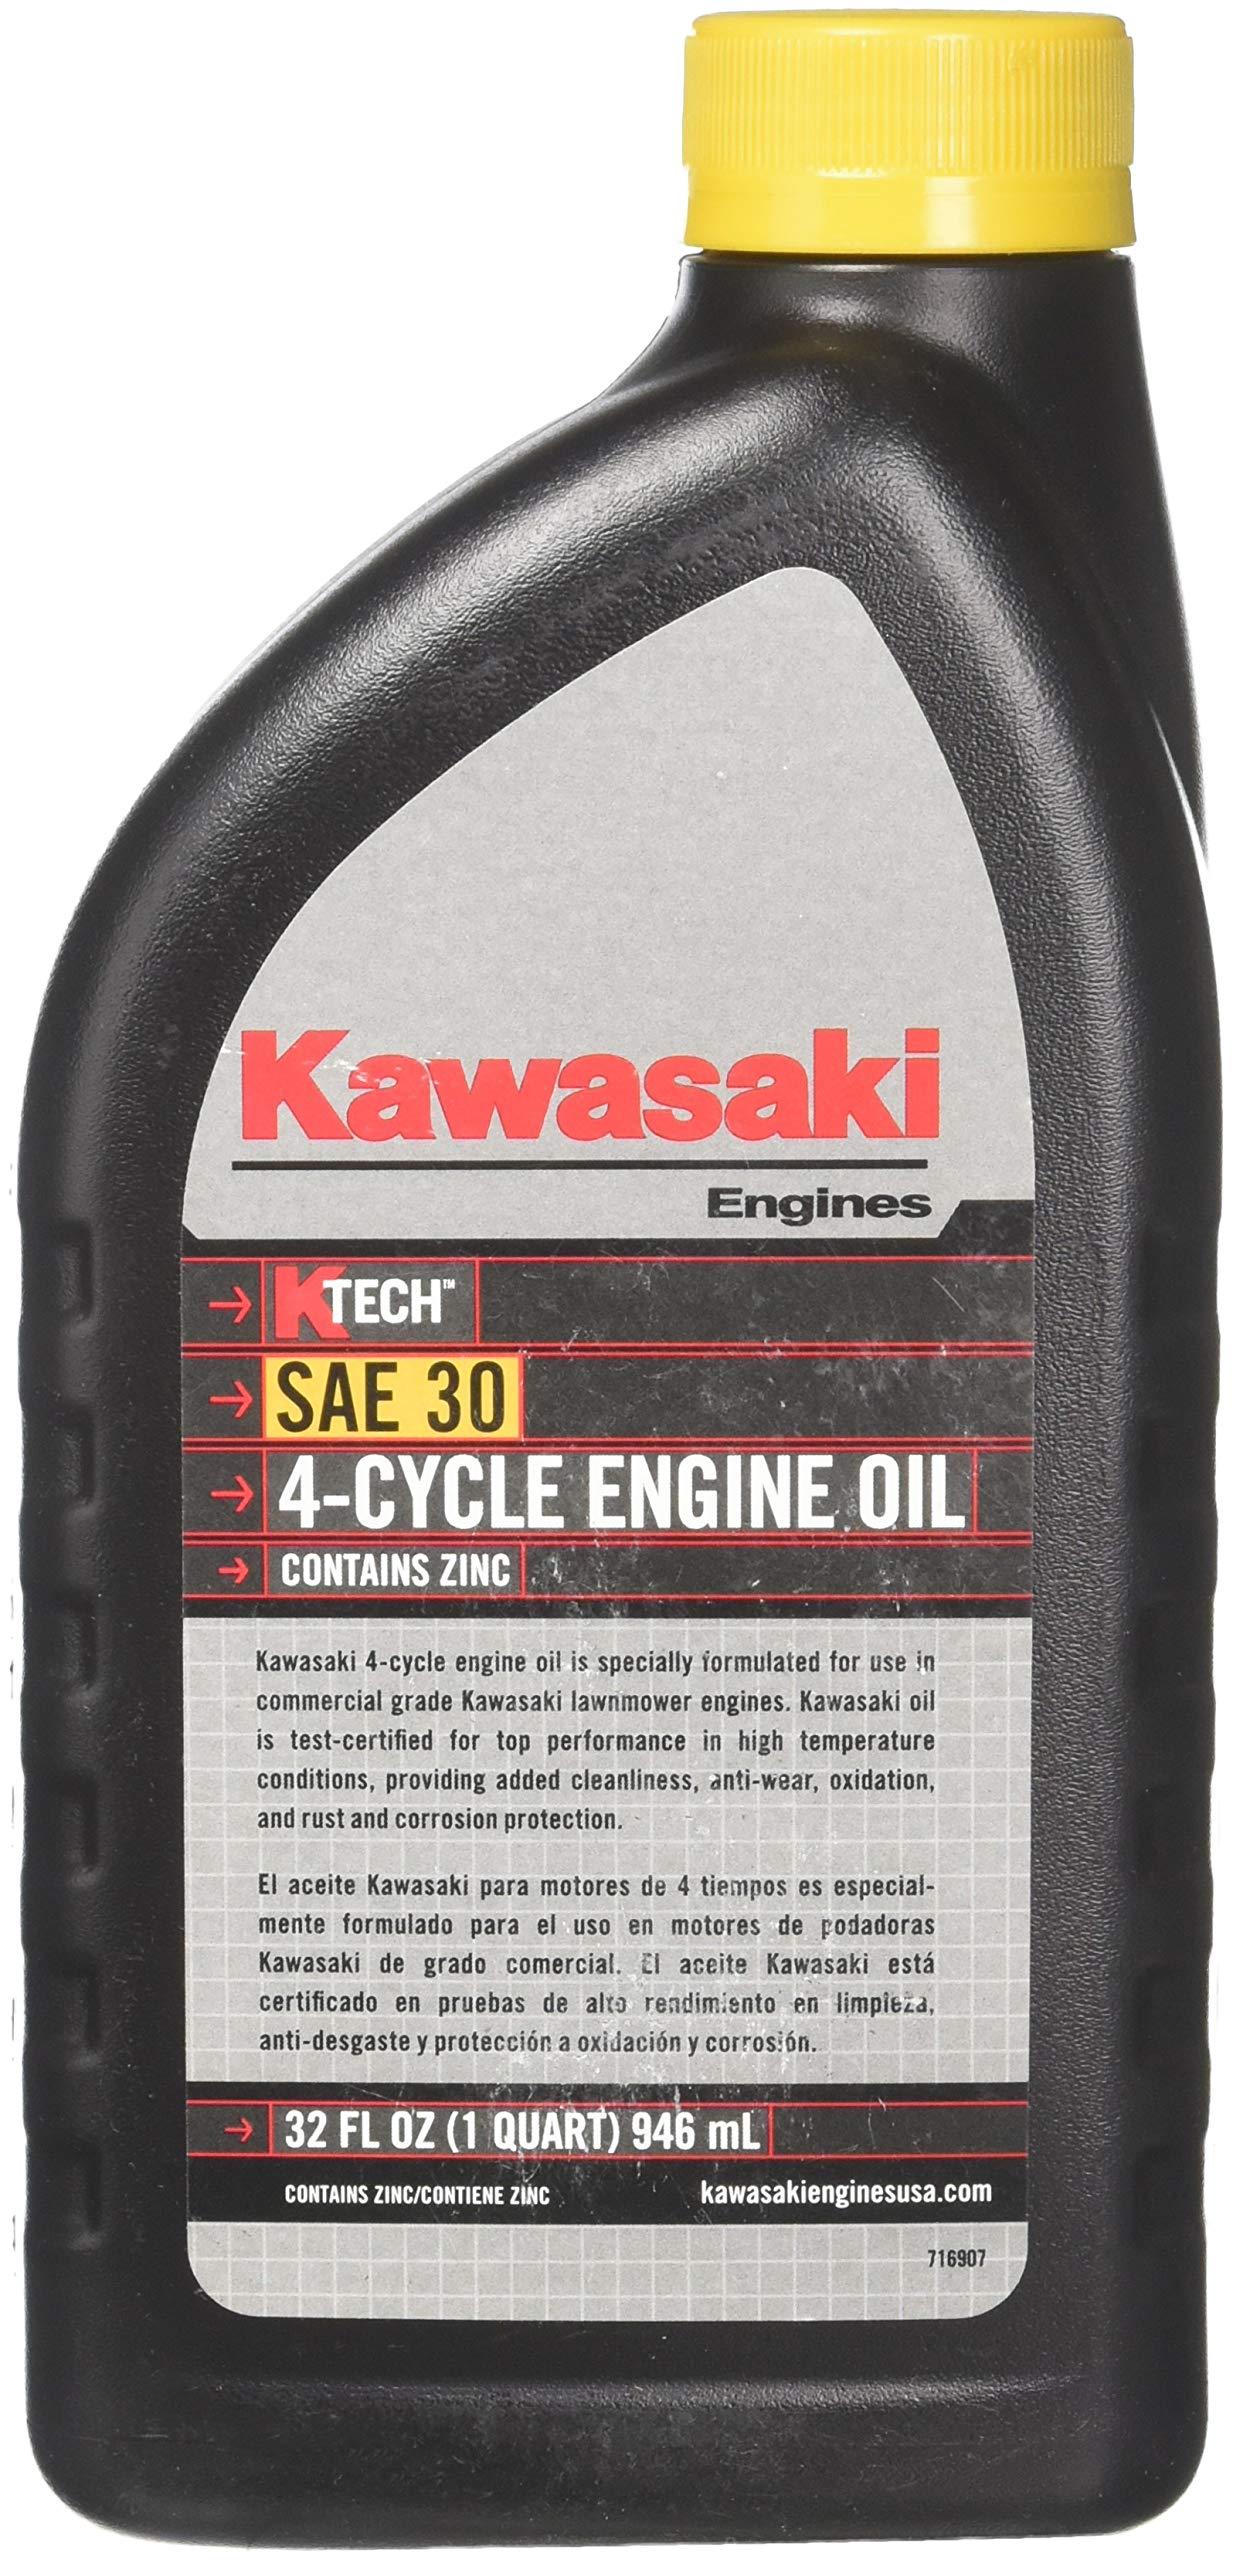 Kawasaki 12PK Genuine 4-Cycle Engine Oil 1QT Bottle SAE 30 K-Tech 99969-6281 by Kawasaki